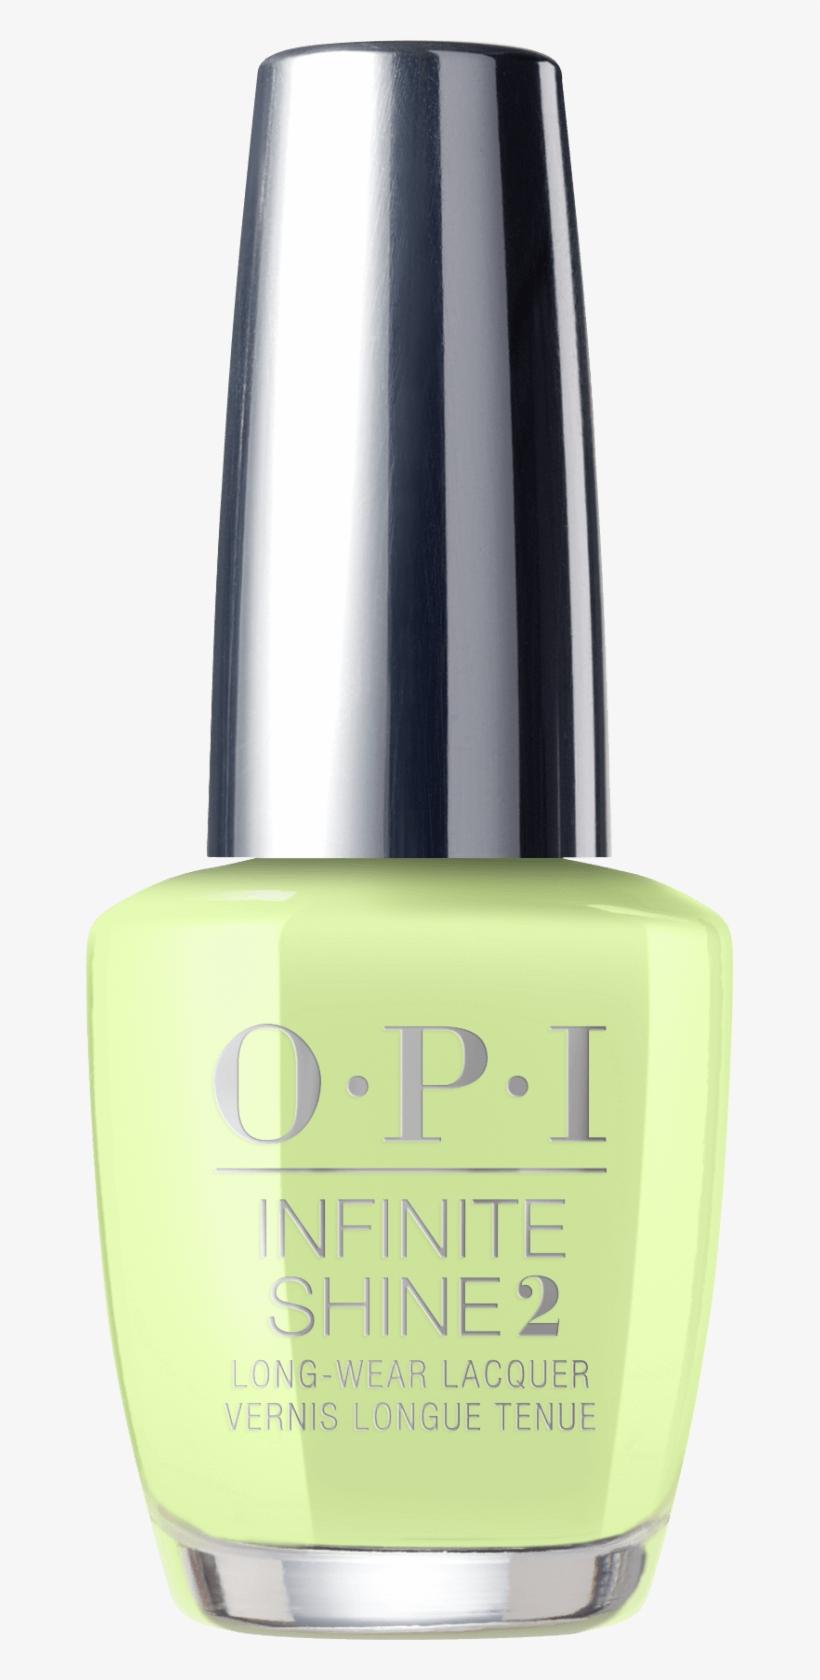 Opi Tokyo Collection Infinite Shine How Does Your Zen - Opi Tinker Tinker Winker, transparent png #7810294